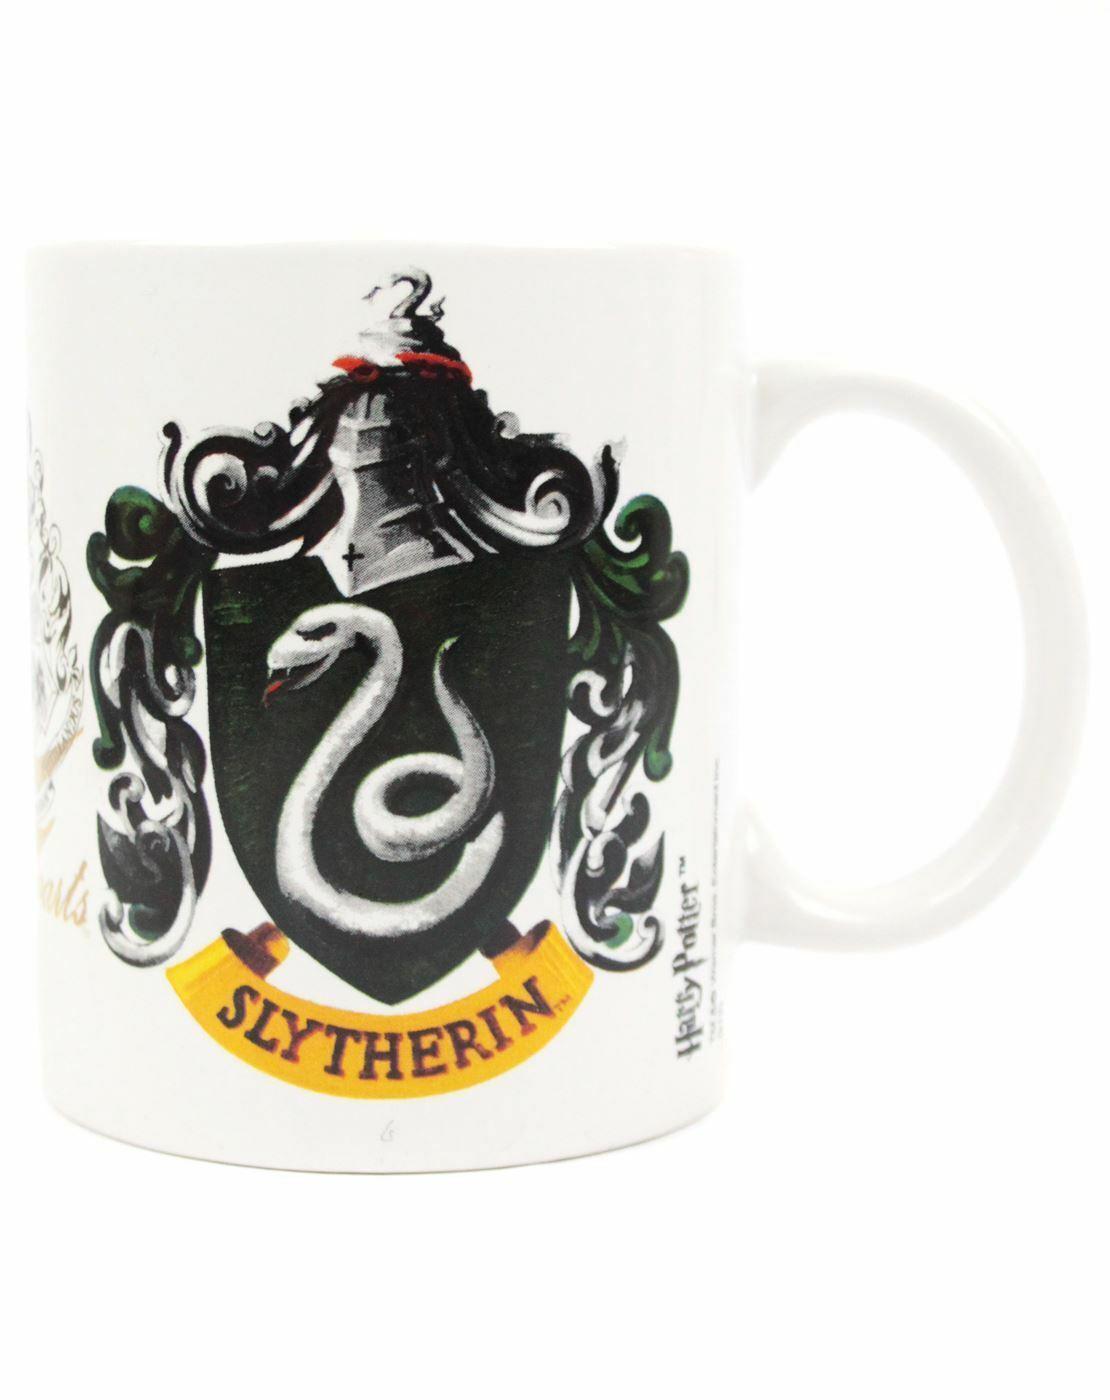 Harry-Potter-Slytherin-Crest-Women-039-s-T-Shirt-and-Mug-Gift-Set-Bundle thumbnail 12